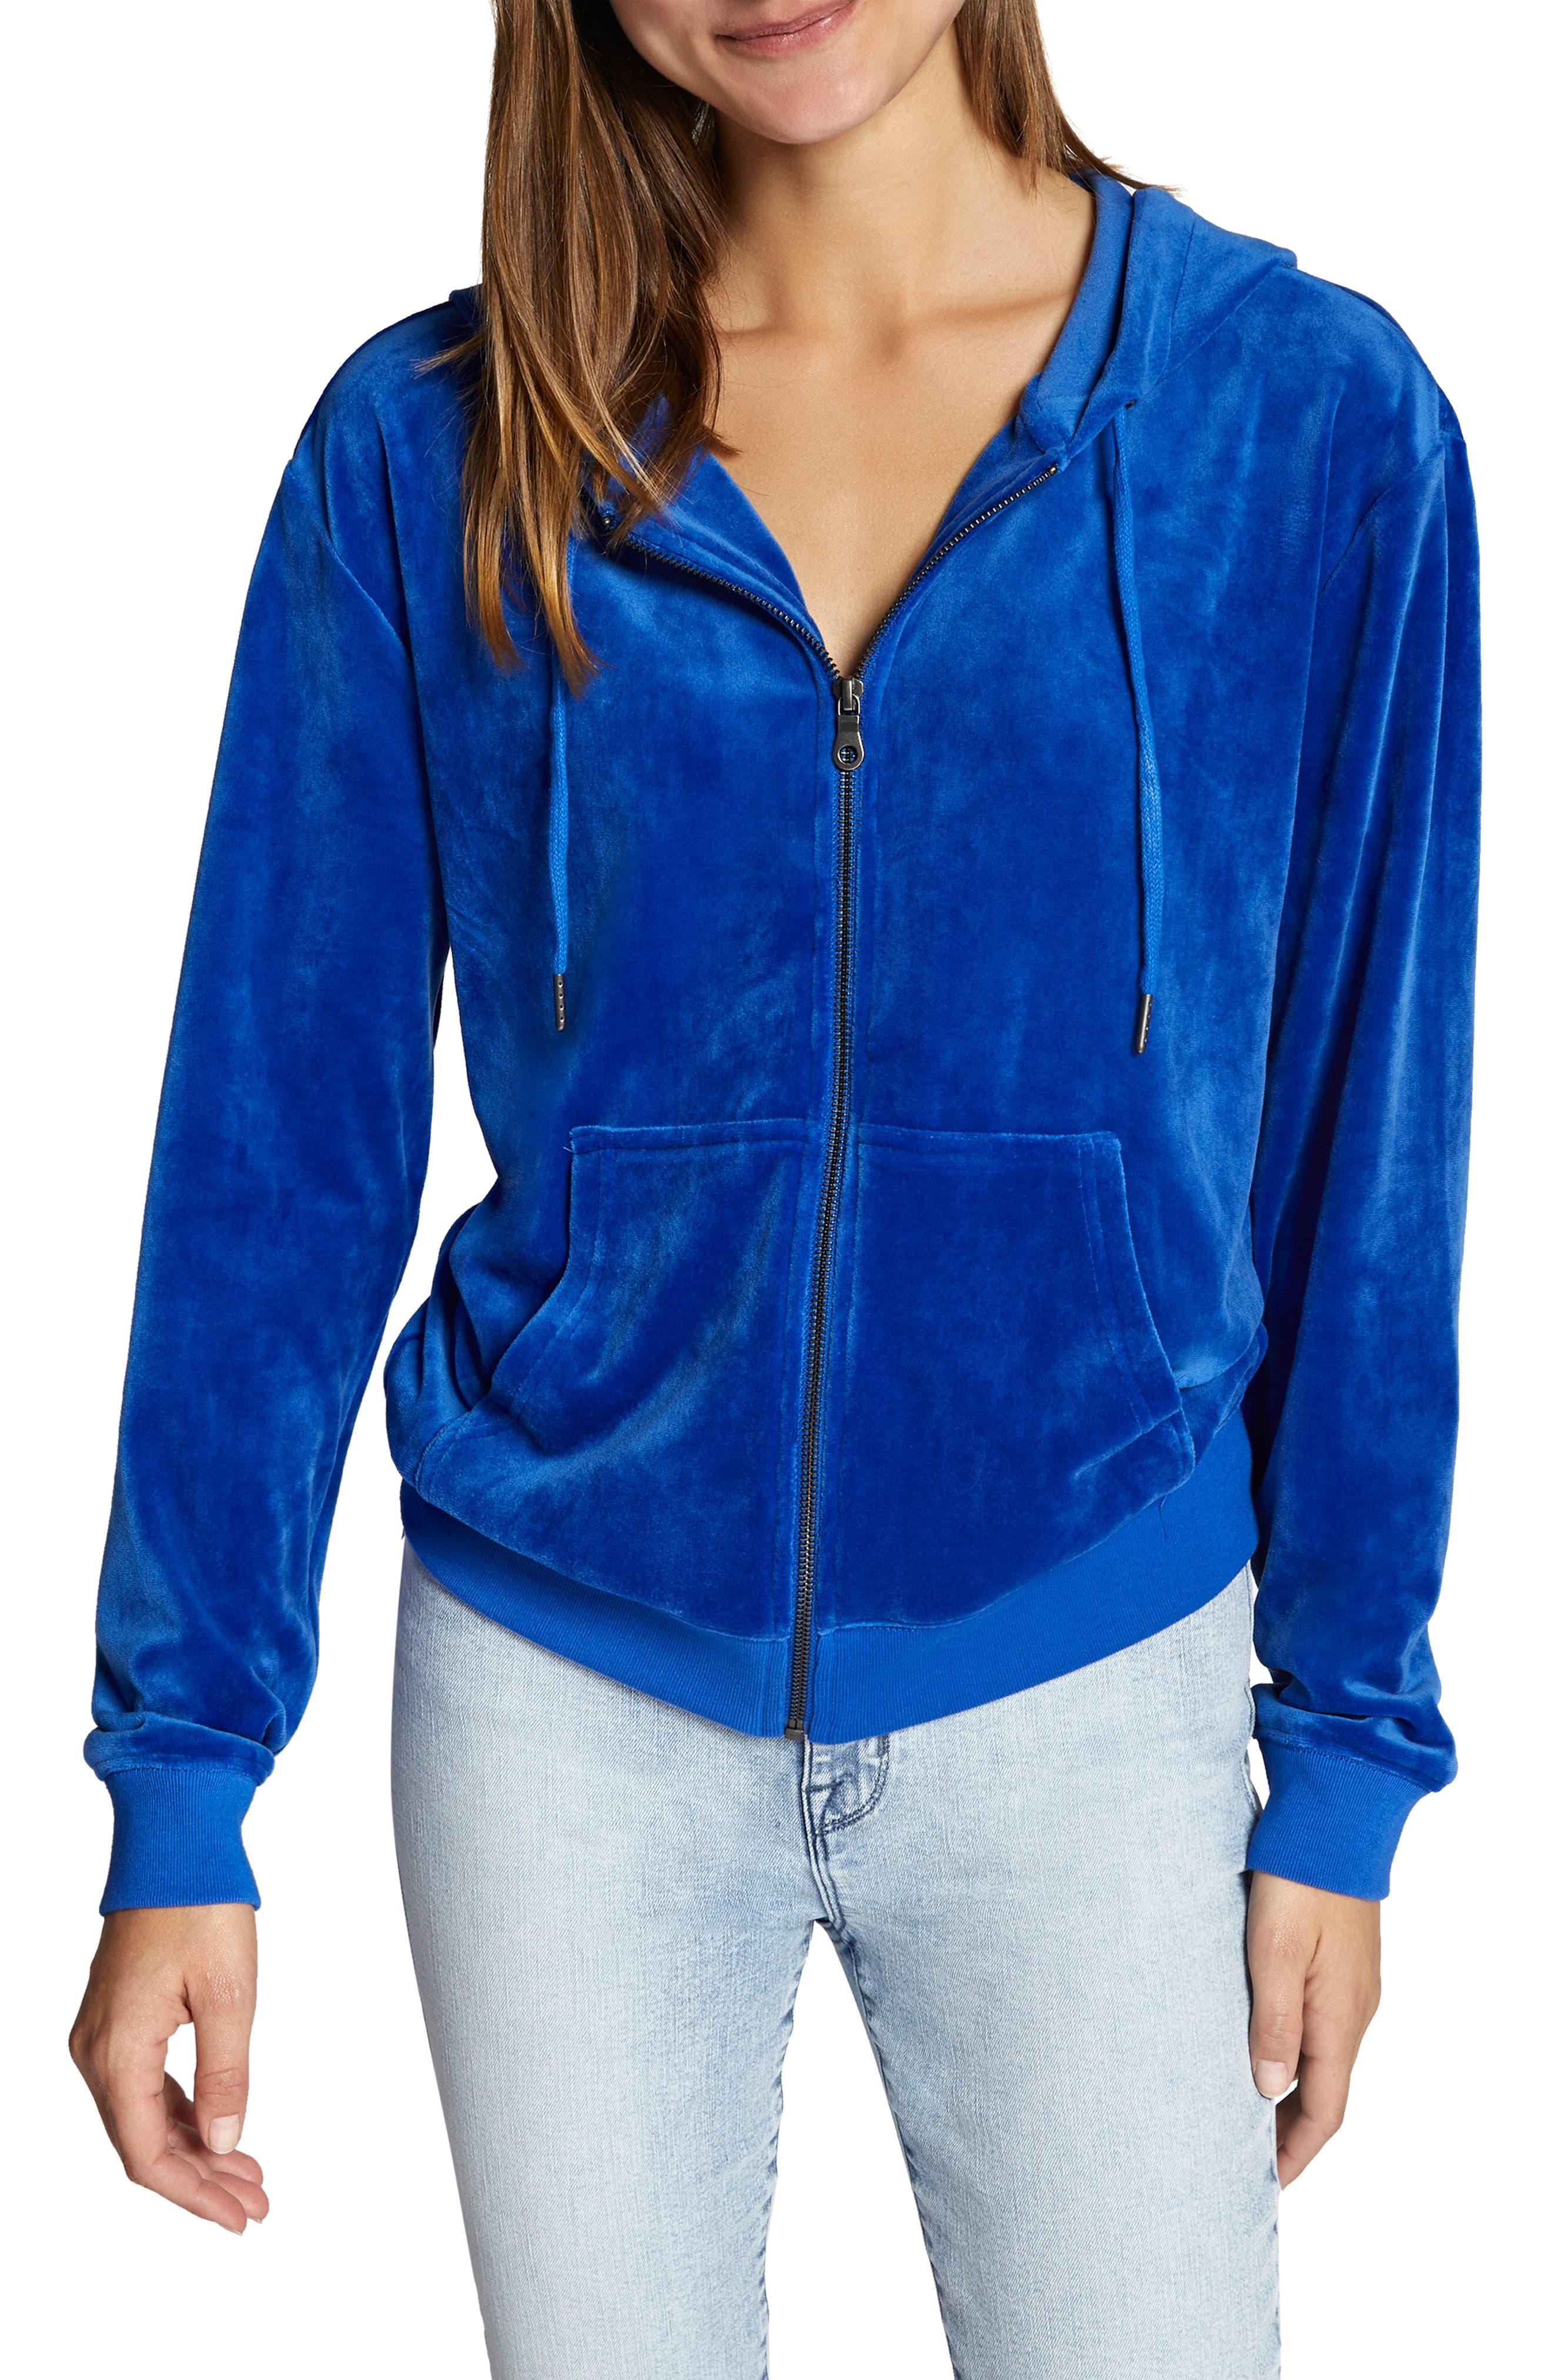 Melrose Raisin Hooded Jacket,                             Main thumbnail 1, color,                             ELECTRIC BLUE